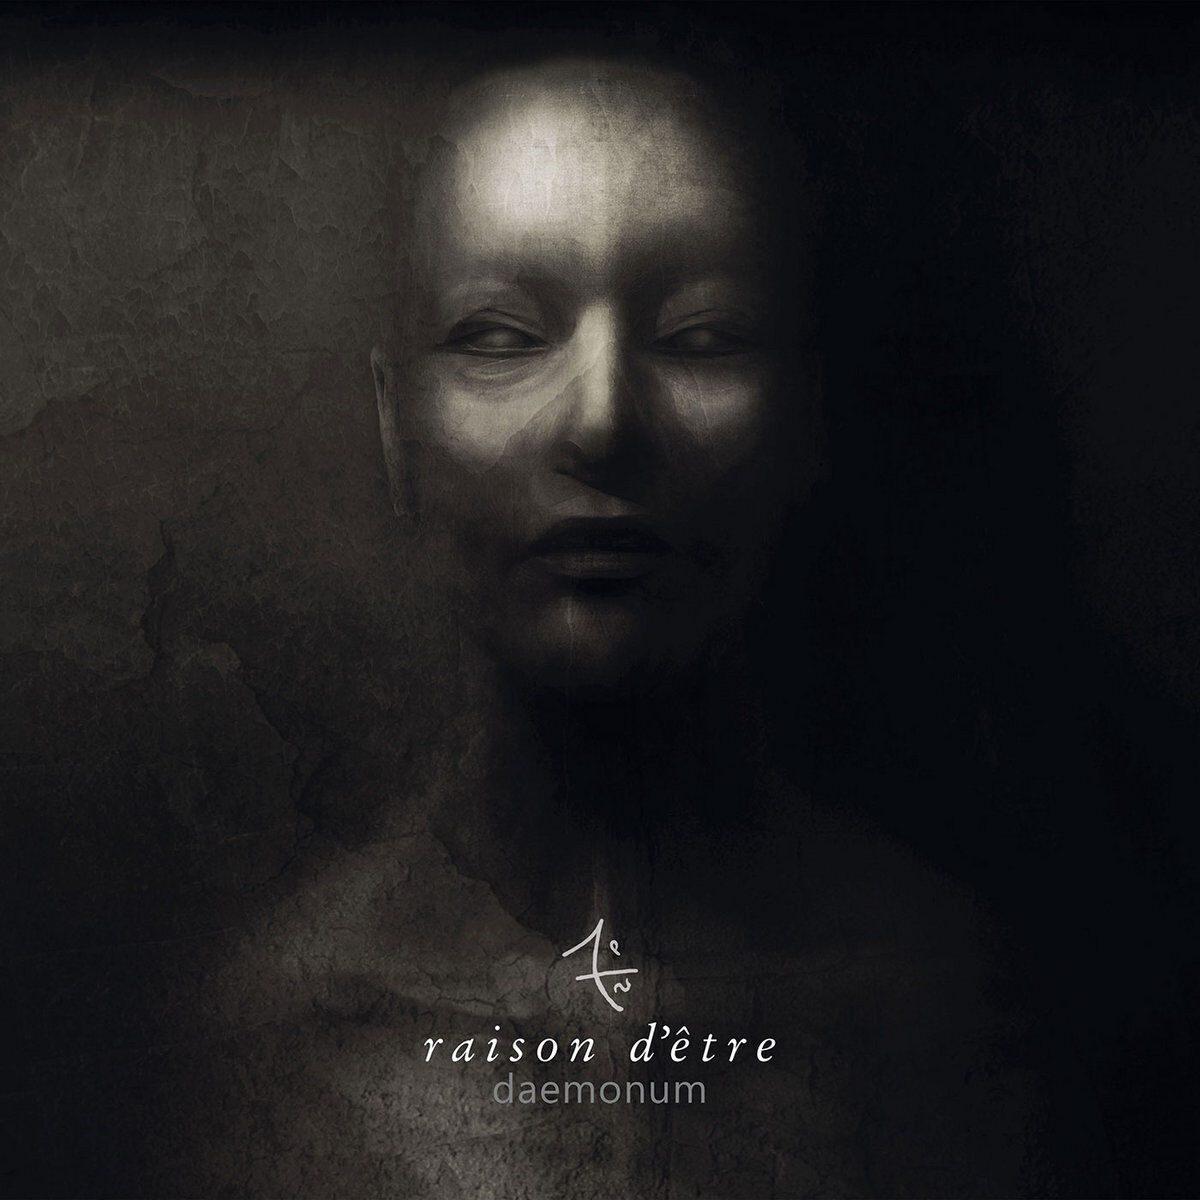 Raison d'Être back with 'Daemonum' album in 4 formats + more on its way